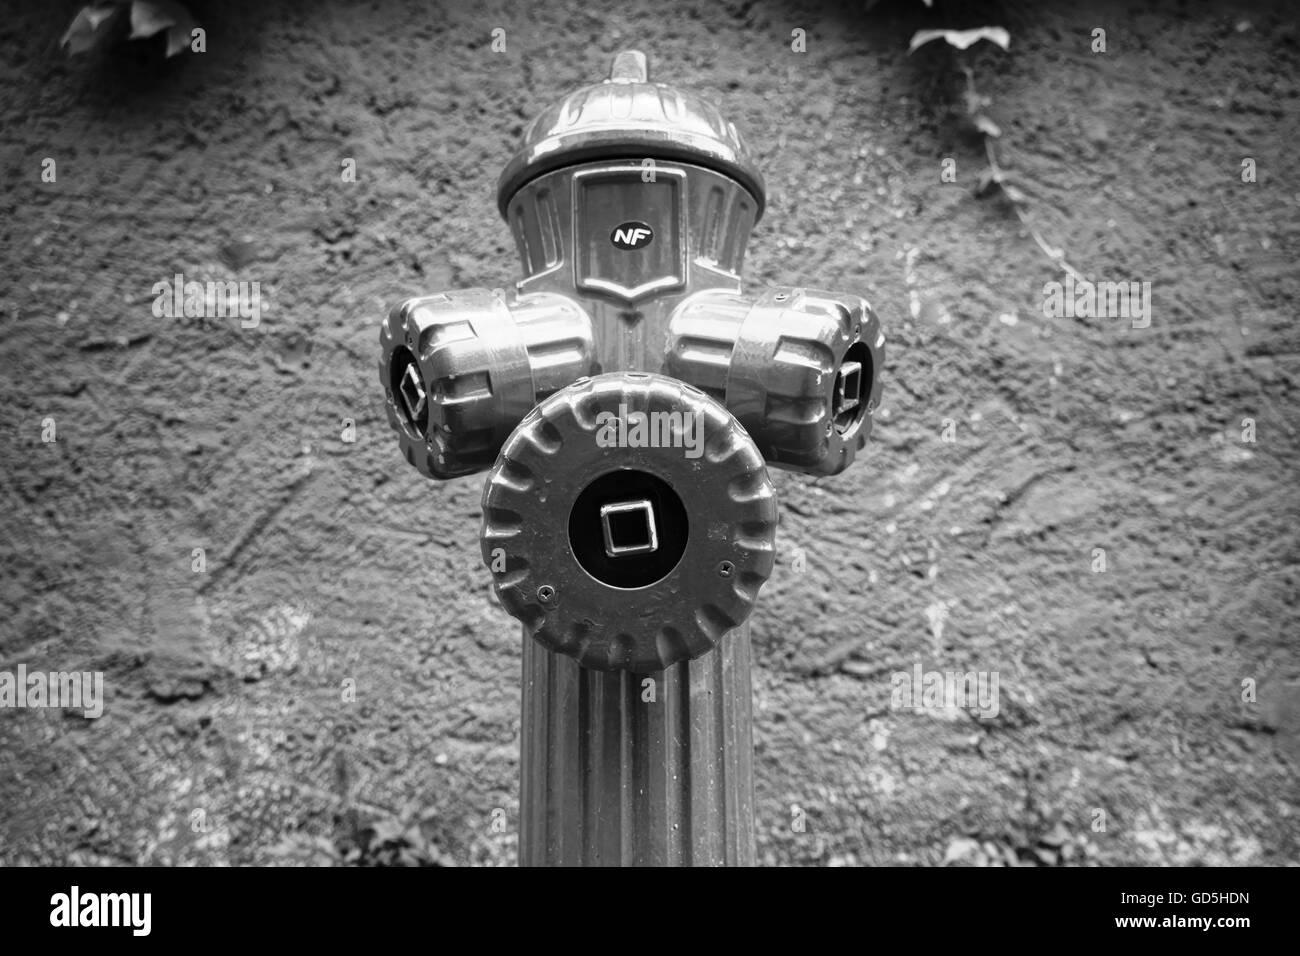 Fire hydrantrural, france, europe - Stock Image